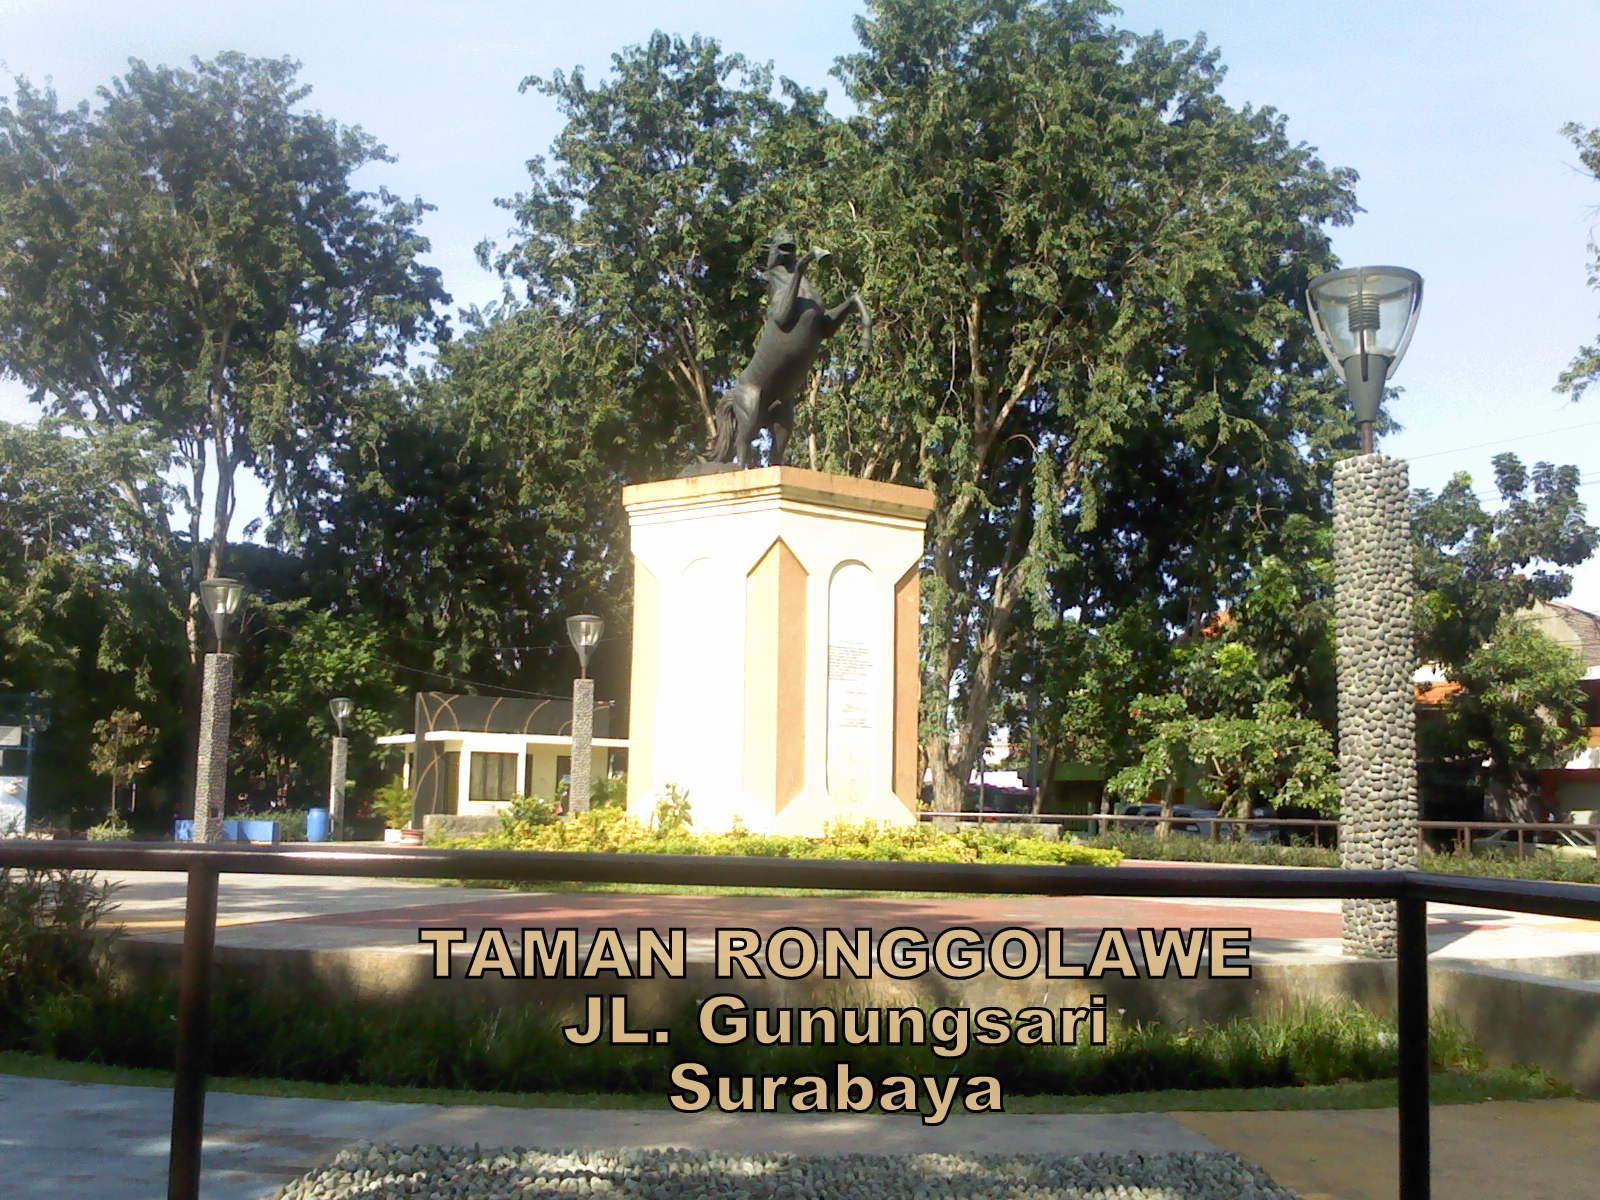 Pesona Monumen Surabaya Laman 6 Dcf Compatable Jpeg Img Taman